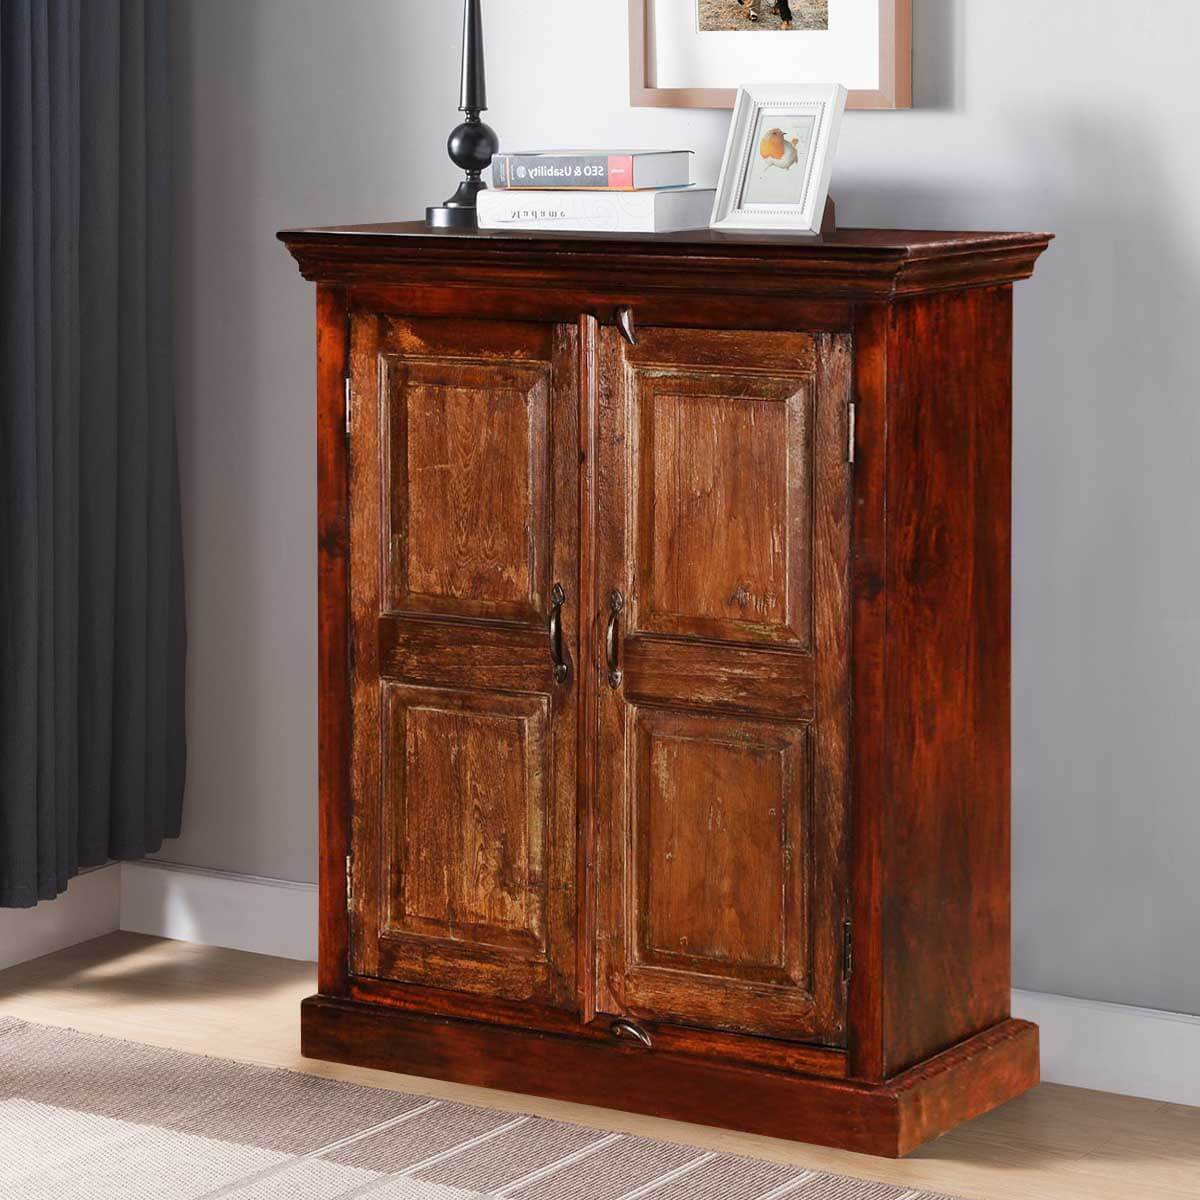 Shaker Rustic Mango & Reclaimed Wood Freestanding Accent